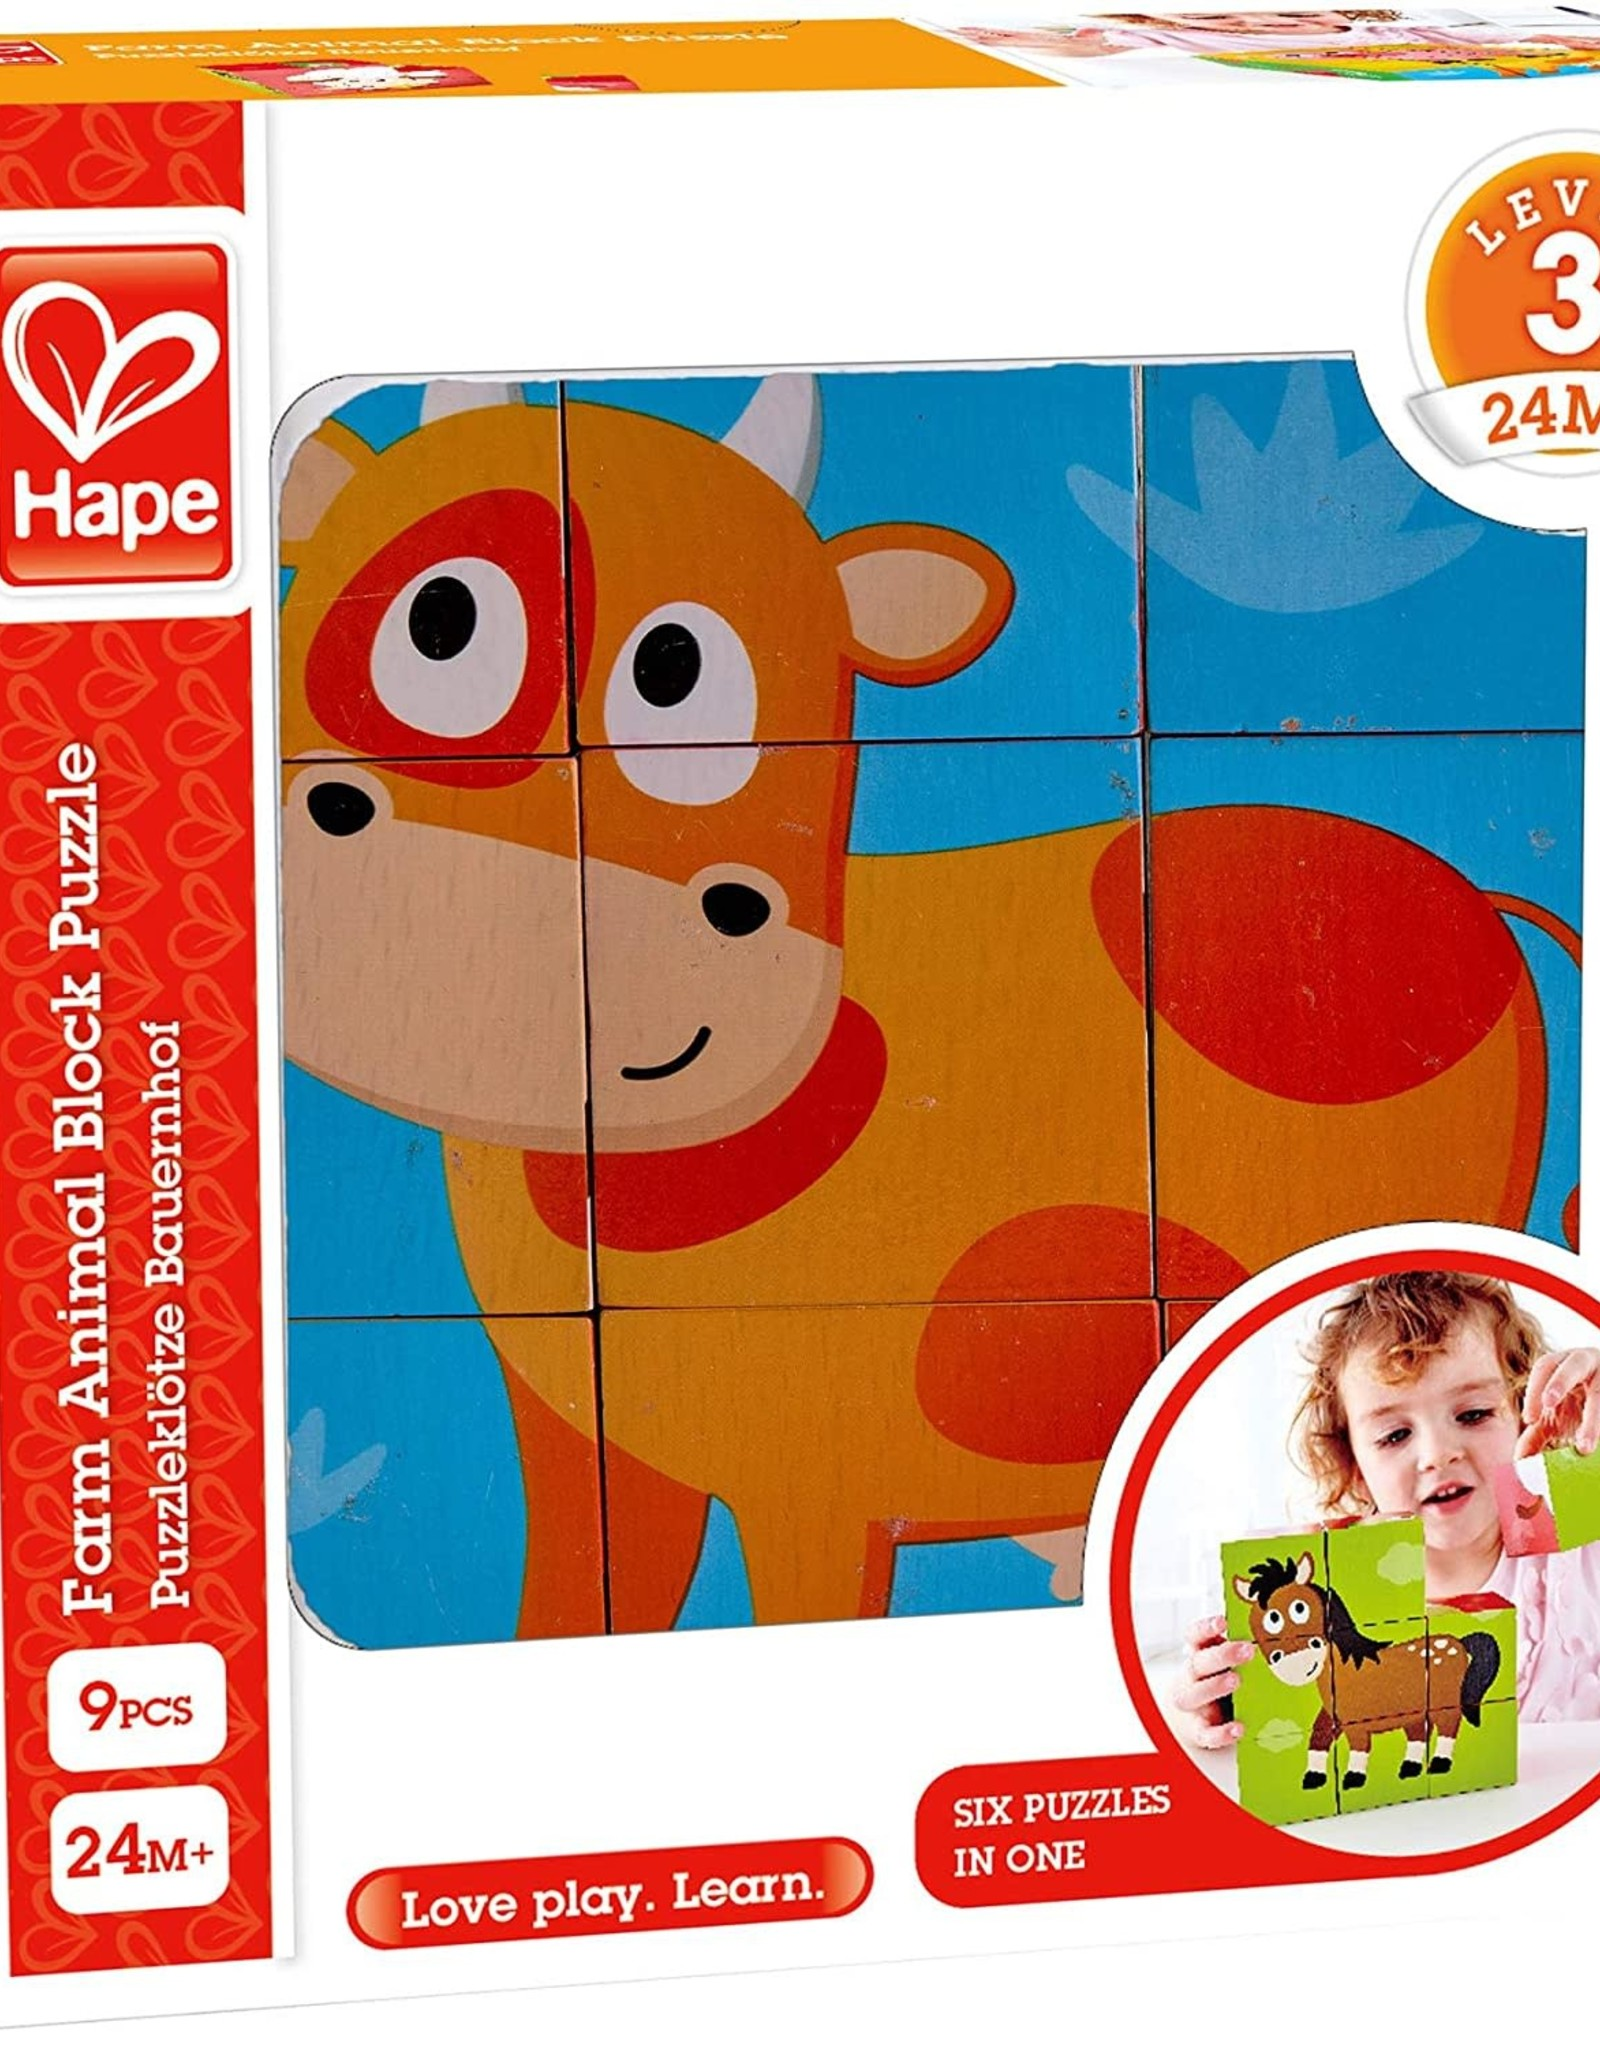 Hape Farm Animal Block Puzzle